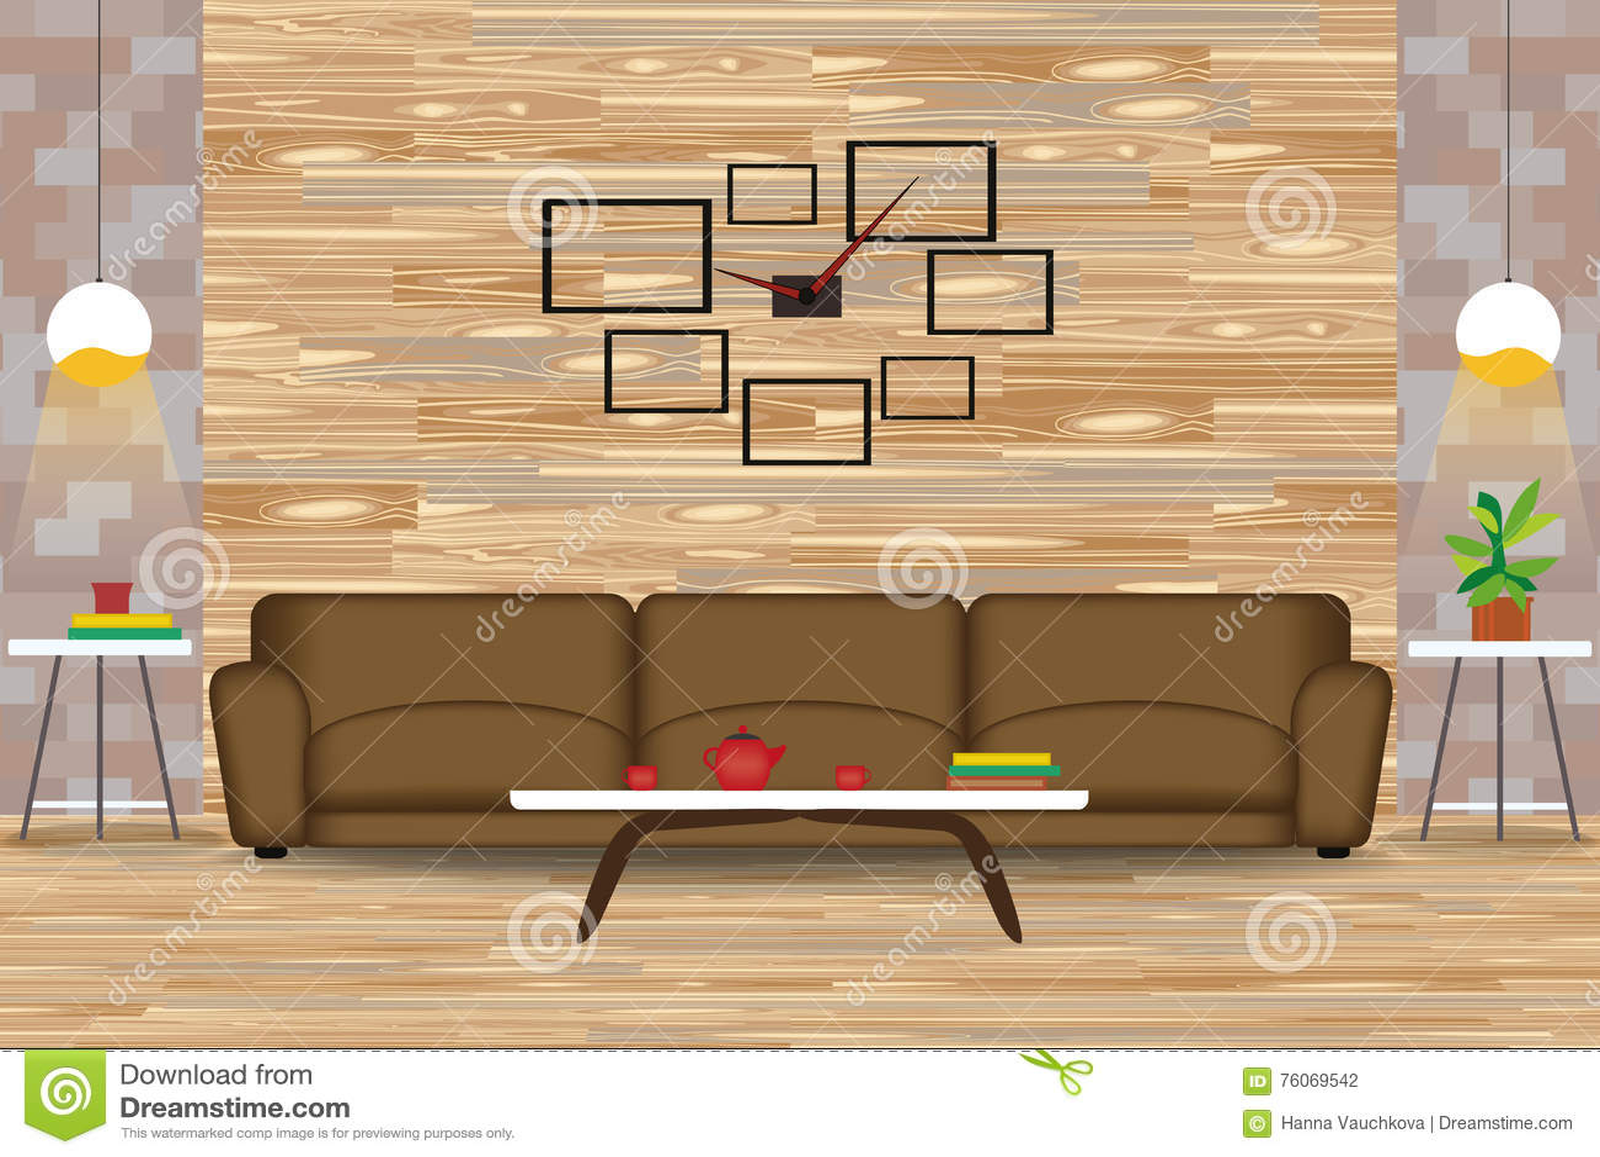 Front Elevation Of Living Room : Modern style interior design vector illustration sofa in